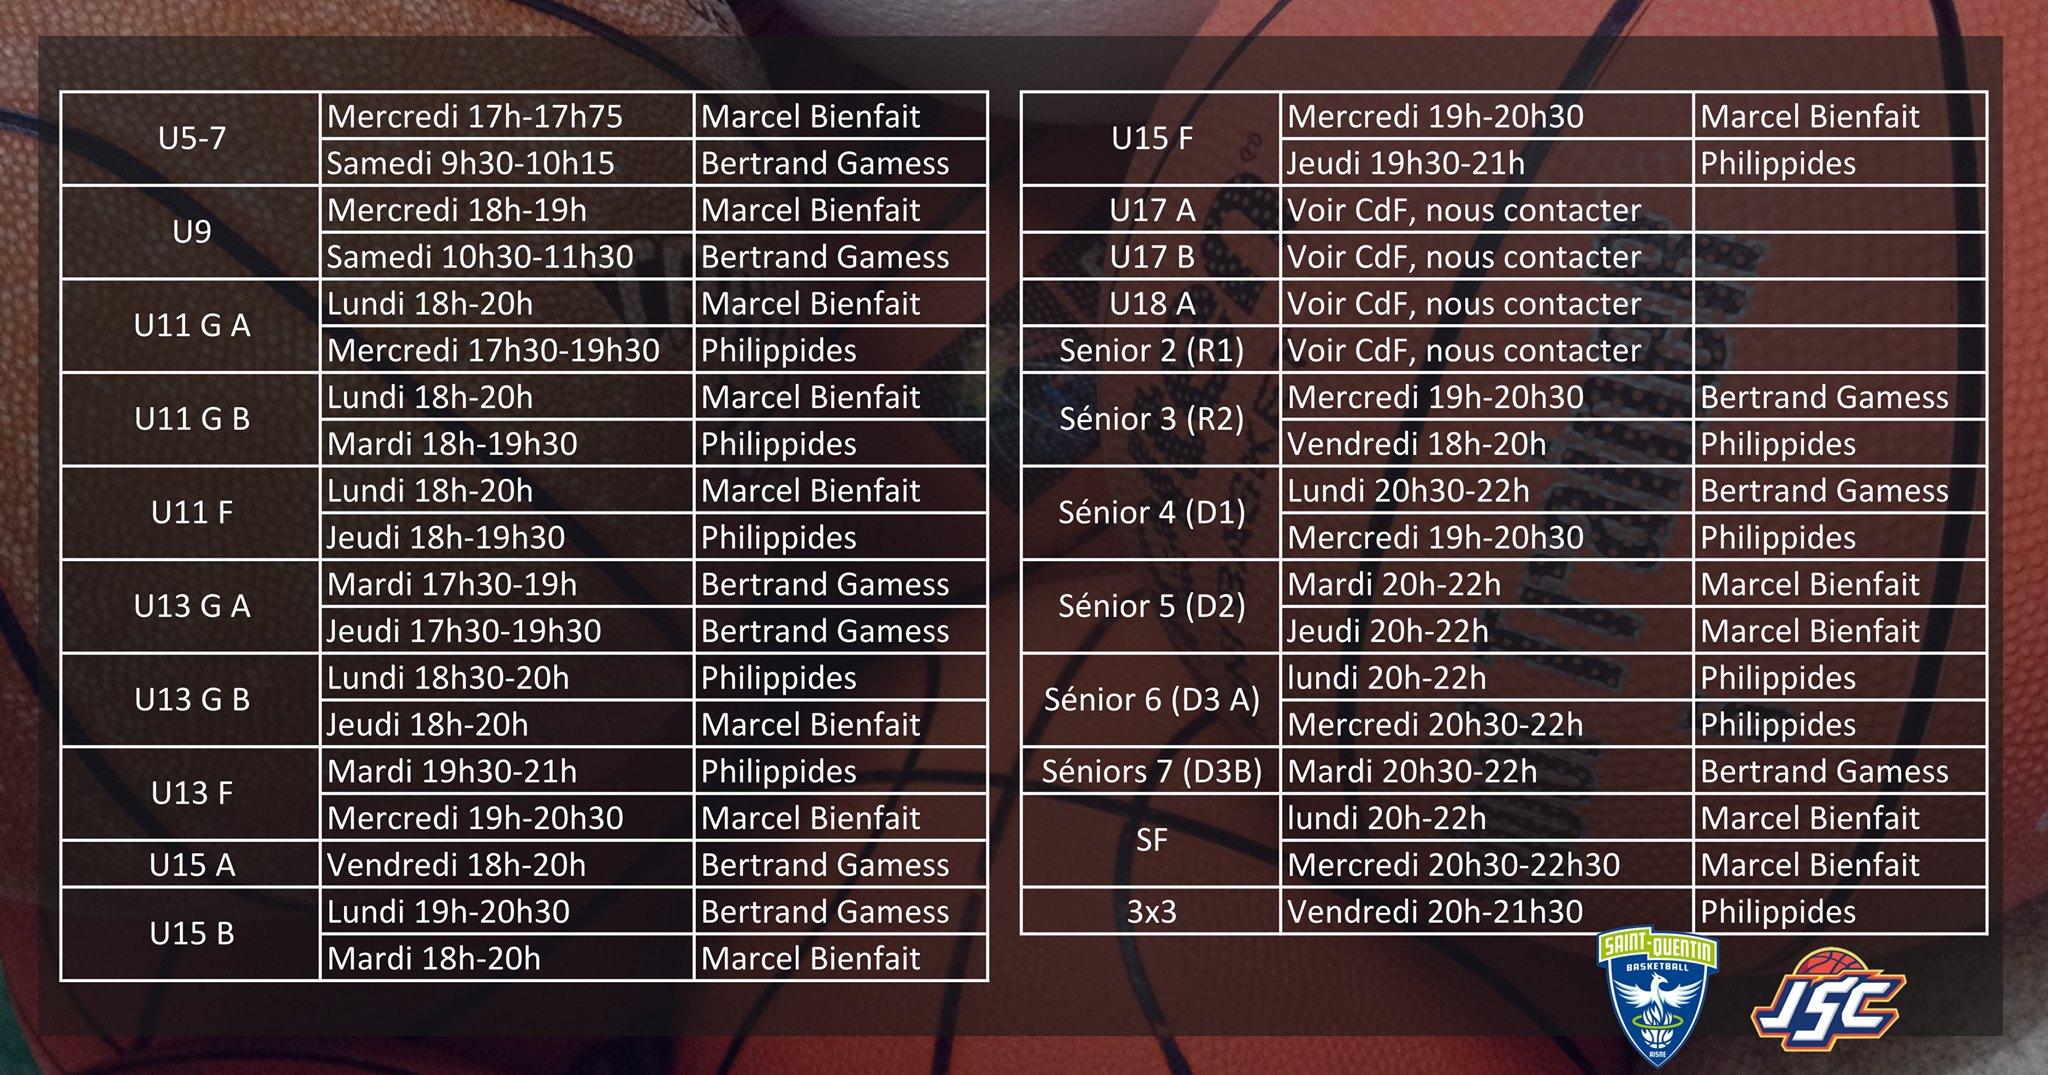 Saint-Quentin Basketball Saint-Quentin Maillot Officiel Ext/érieur 2019-2020 Maillot de Basketball Mixte